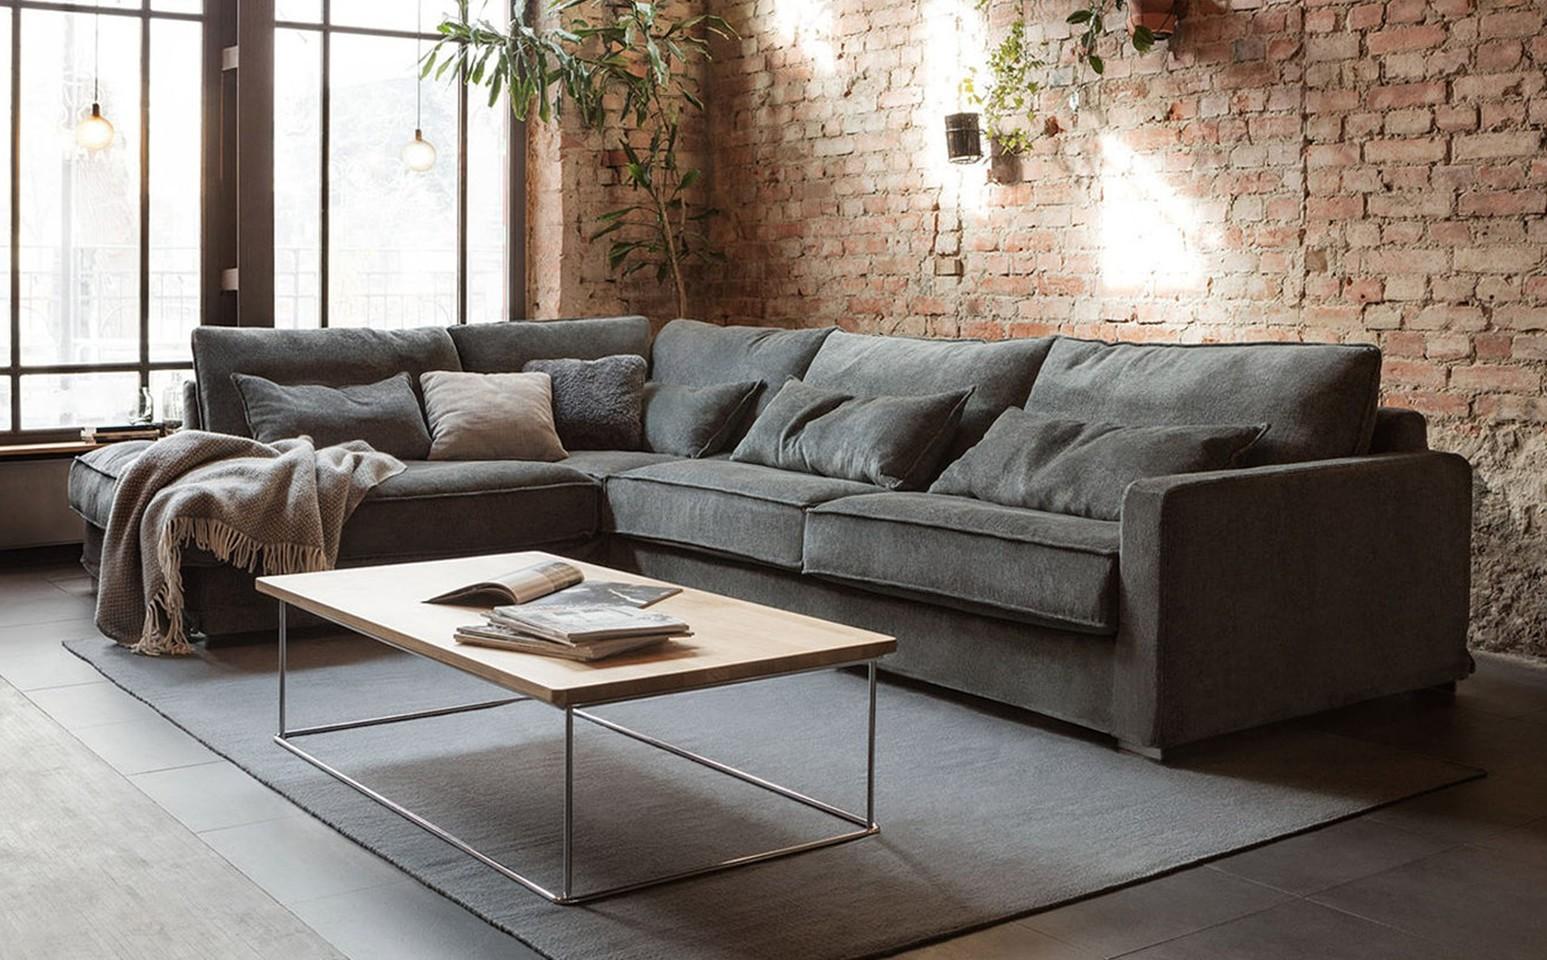 Фиеста угловой диван Колфилд м358